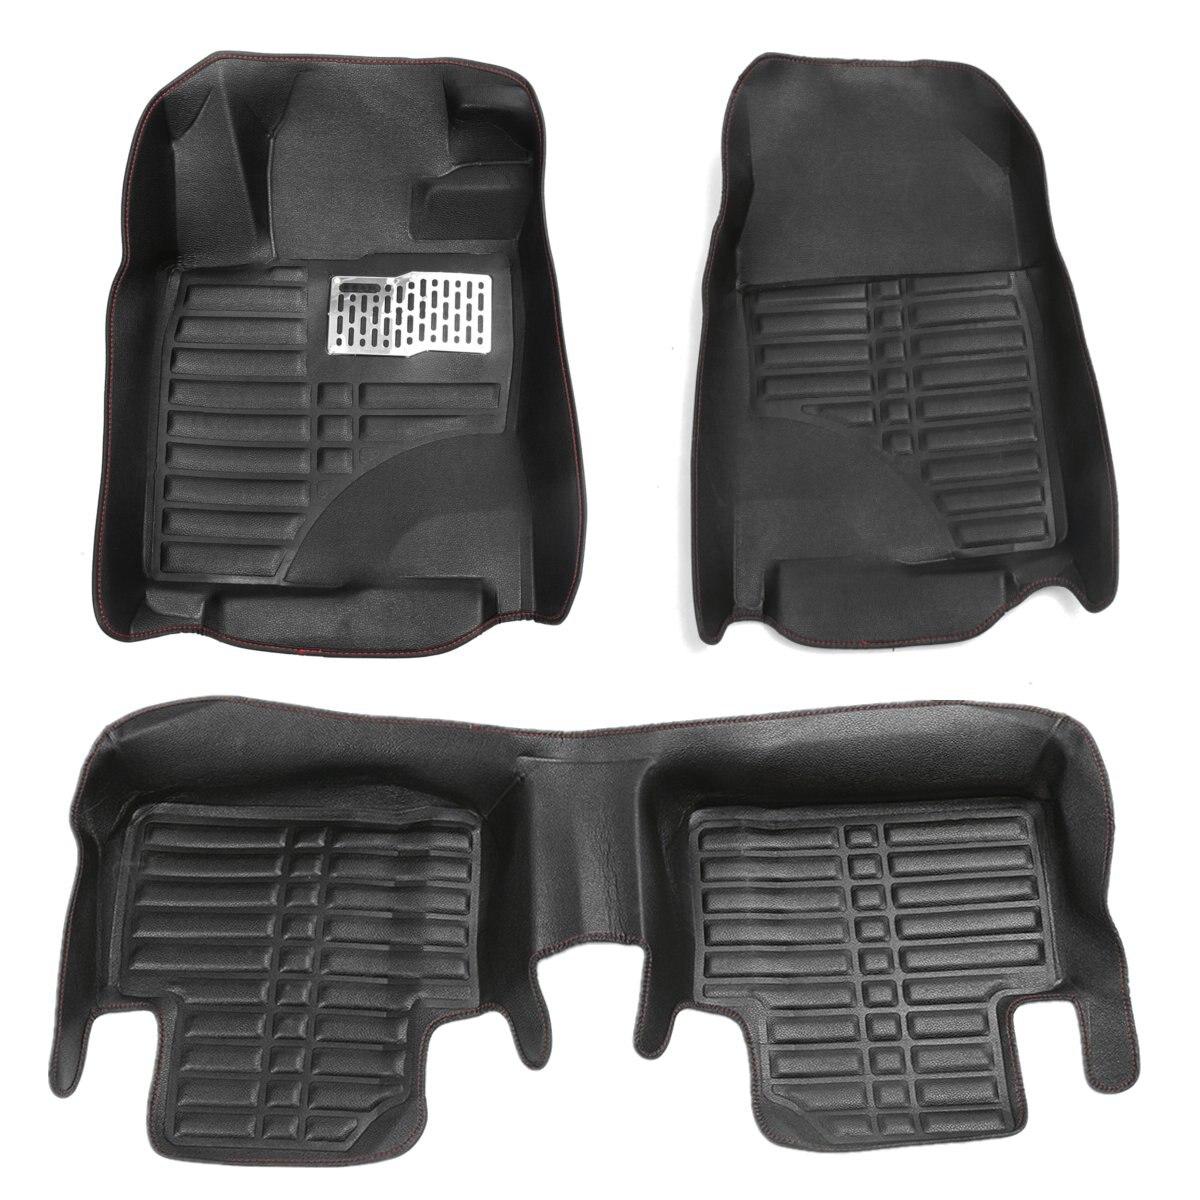 Black Car Floor Front & Rear Leather Mat Liner Waterproof Mat For Honda /Civic 2016 car pad for honda civic 1 8l 2 0l pad mat cup pad 16 modified leather latex